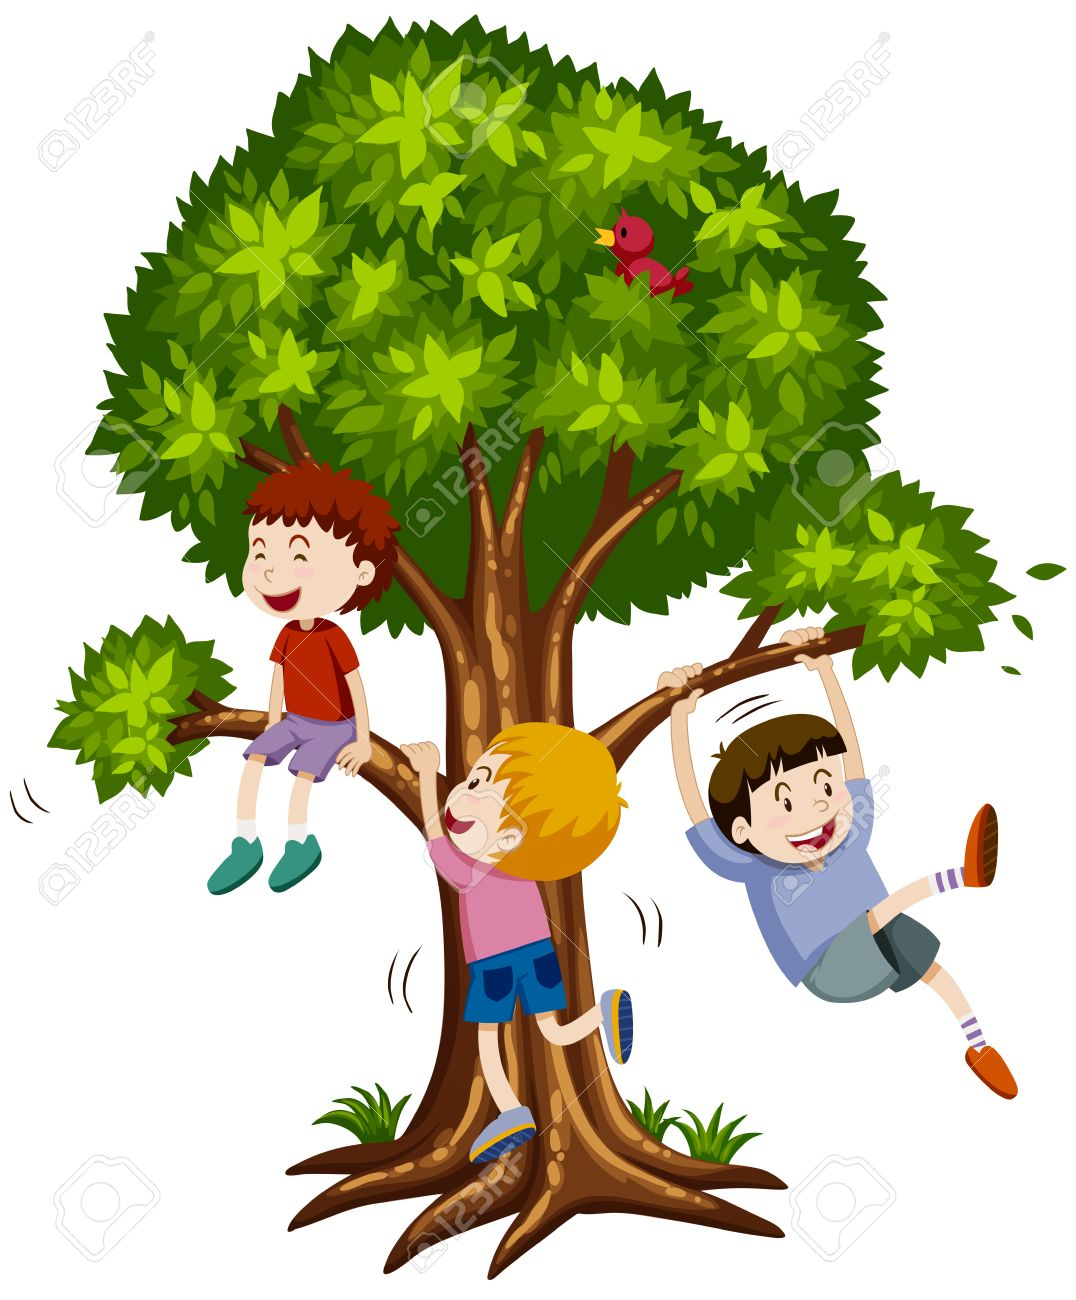 Three Boys Climbing The Tree Illustration Royalty Free Cliparts Vectors And Stock Illustration Image 52037635 Vector cartoon illustration of kids playng tree house on summer green landscape. three boys climbing the tree illustration